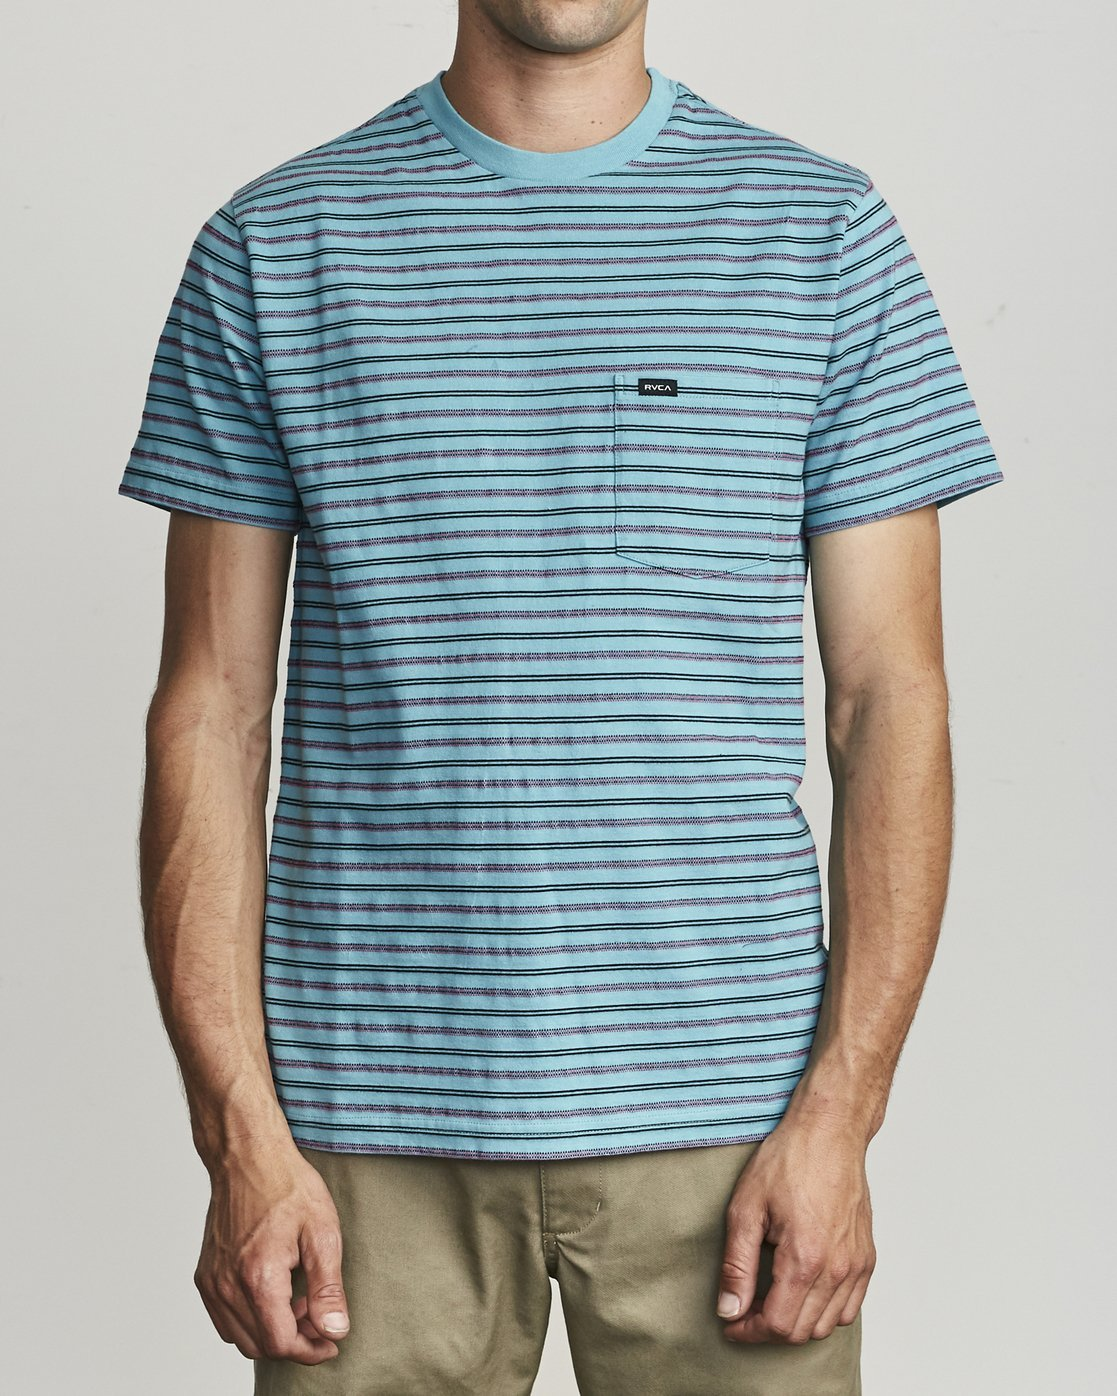 0 Runaway - T-Shirt à rayures pour Homme Bleu S1KTRDRVP0 RVCA